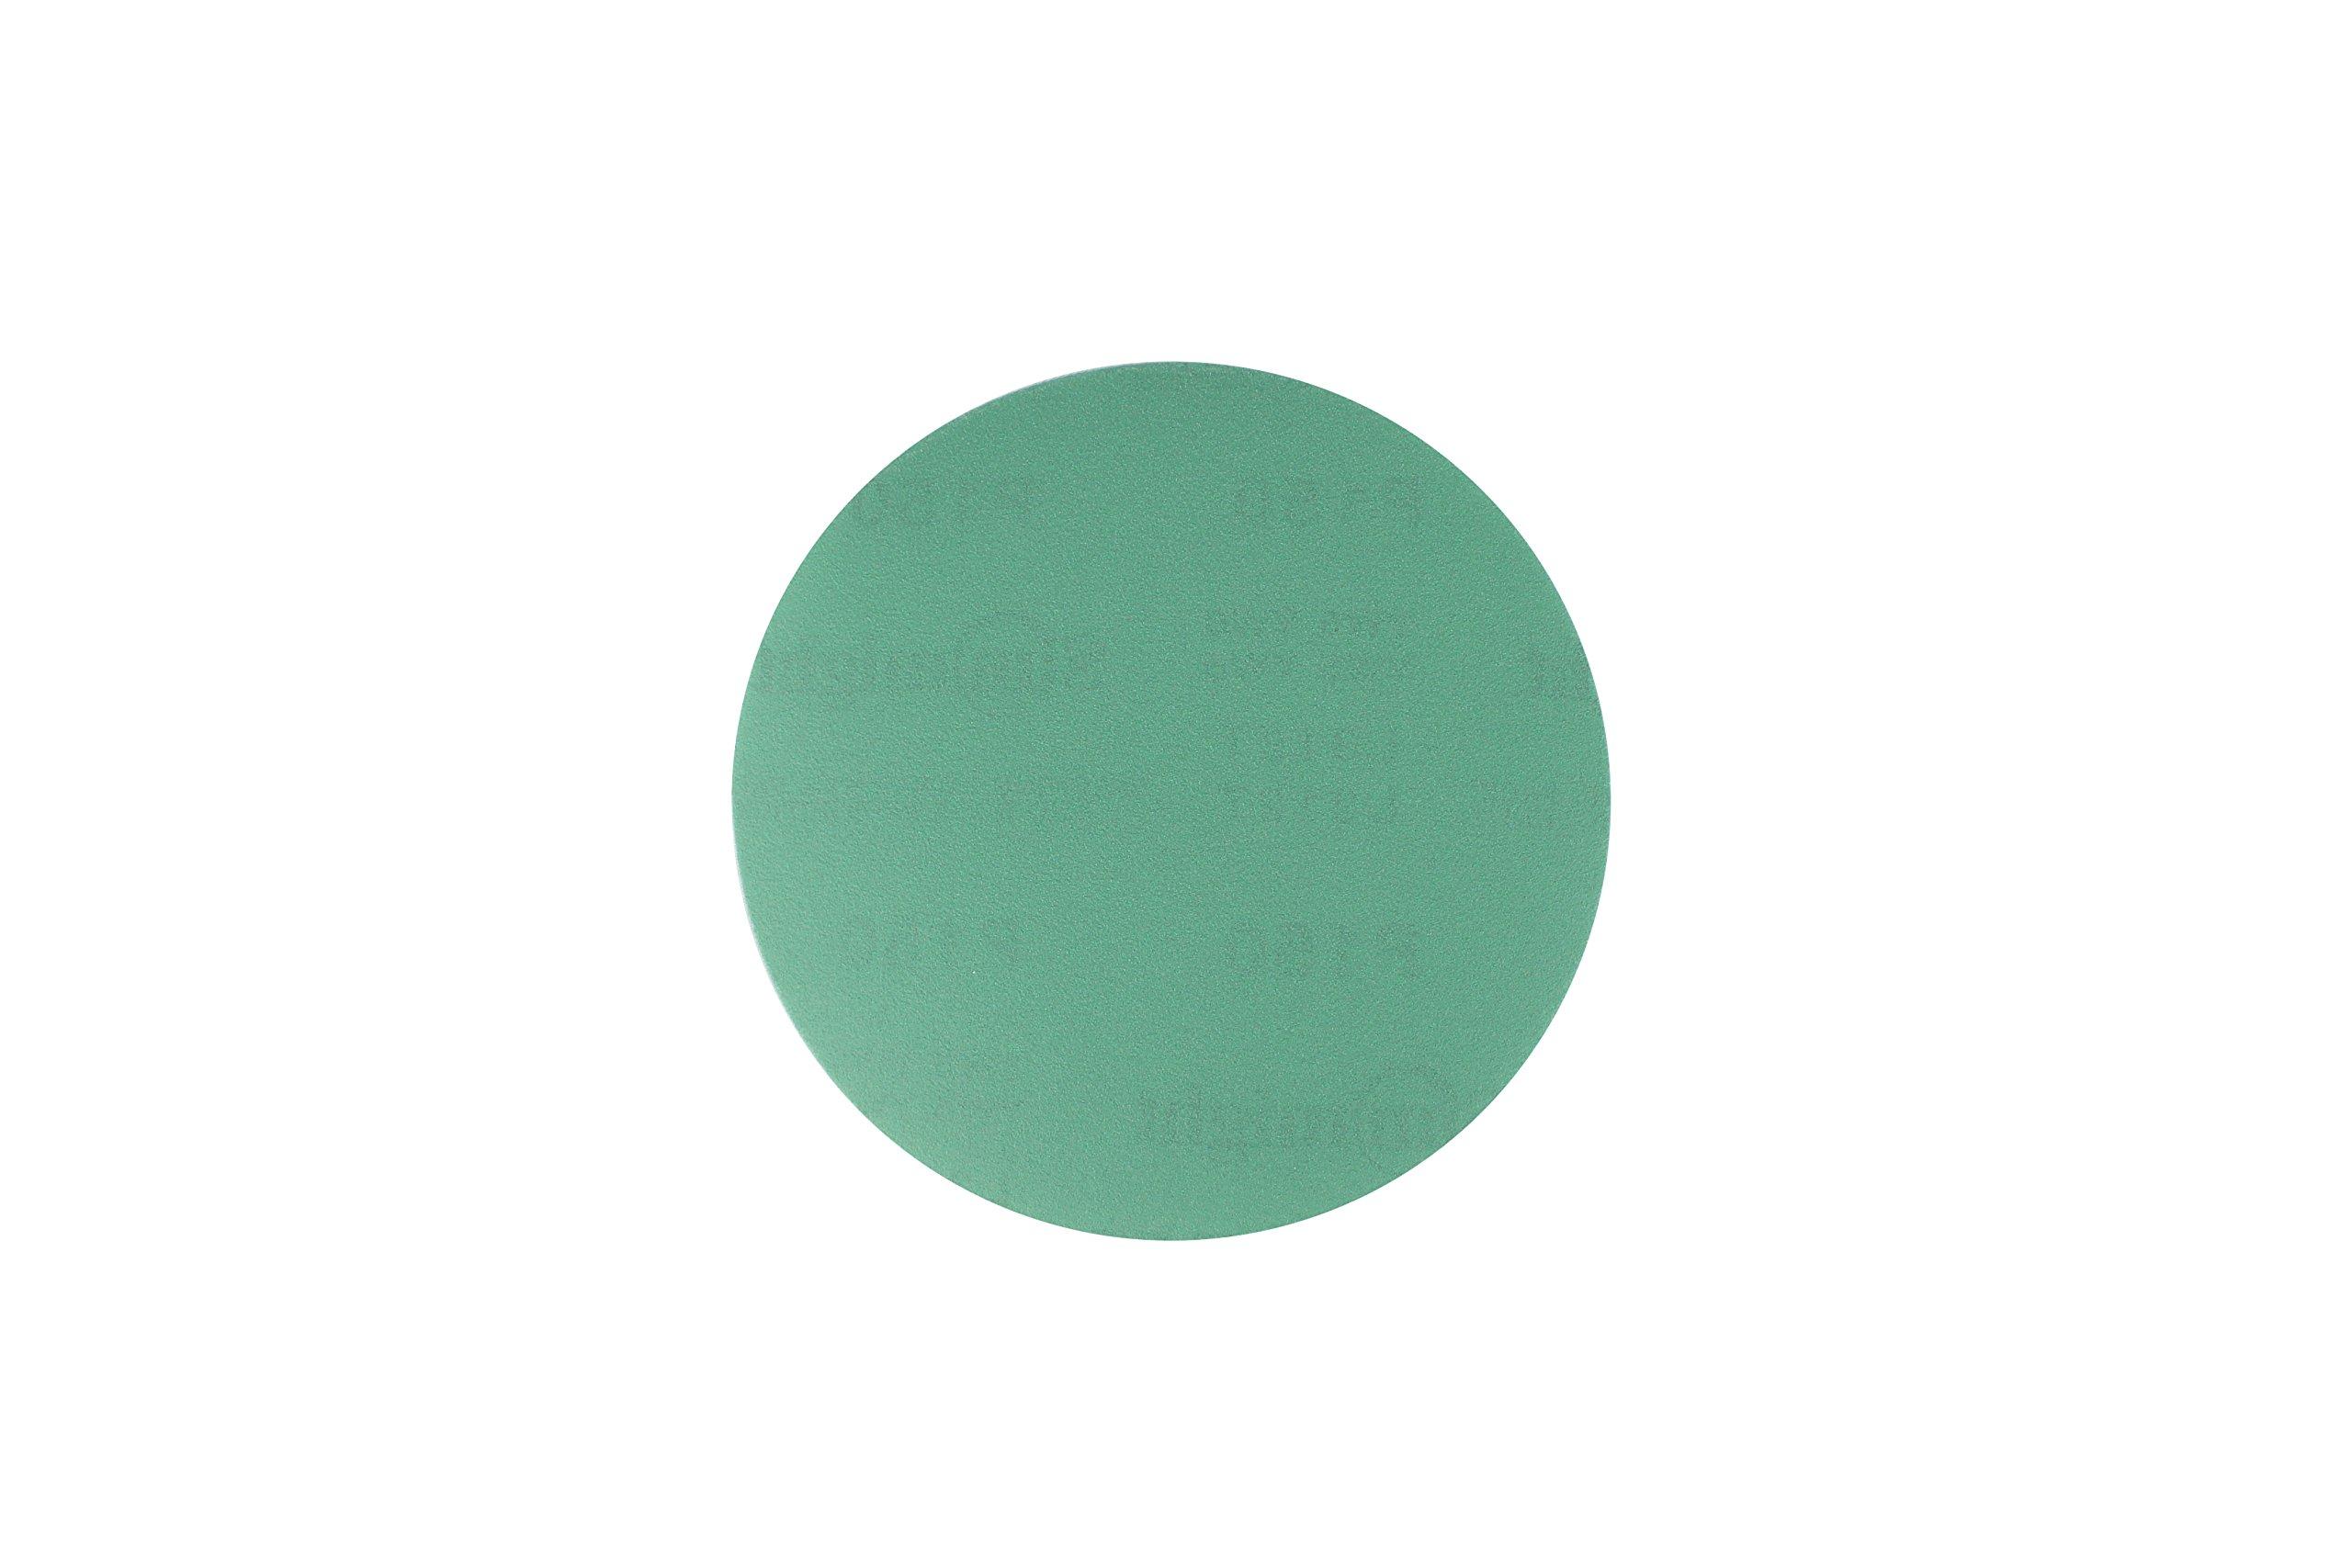 Sunmight 01409 6'' No Hole Velcro Disc (Film Grit 150)